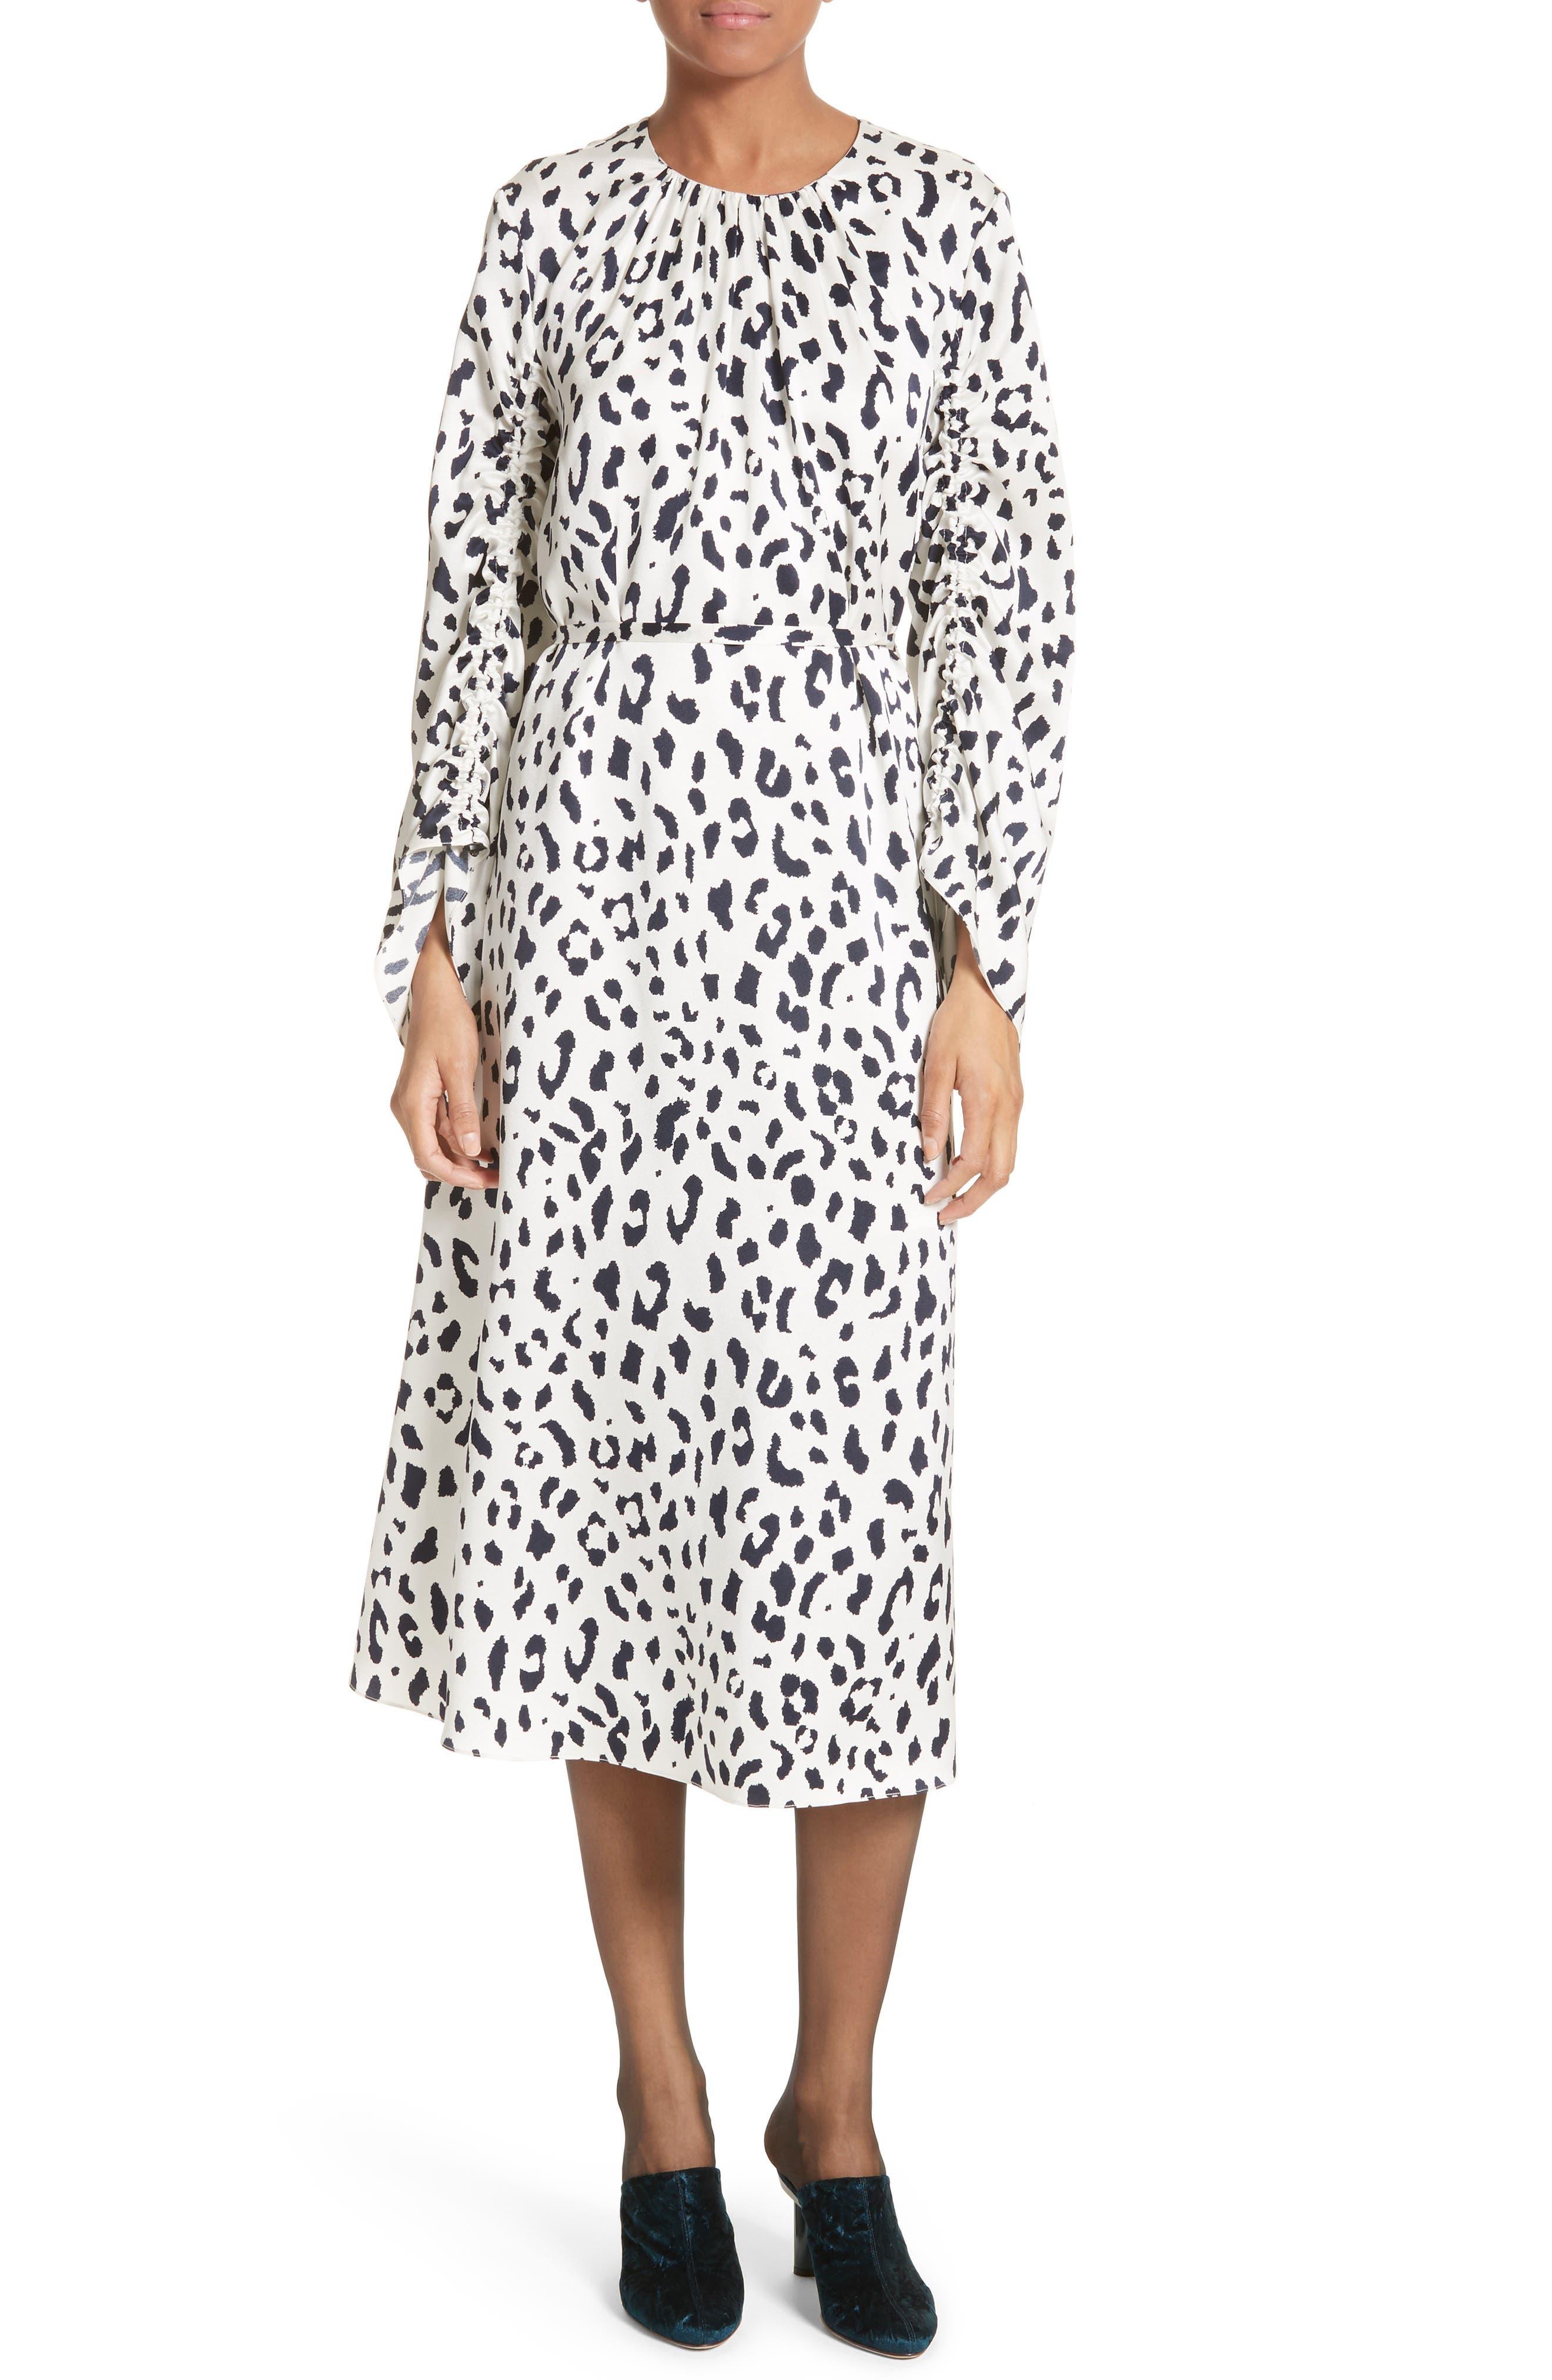 Alternate Image 1 Selected - Tibi Cheetah Satin Dress